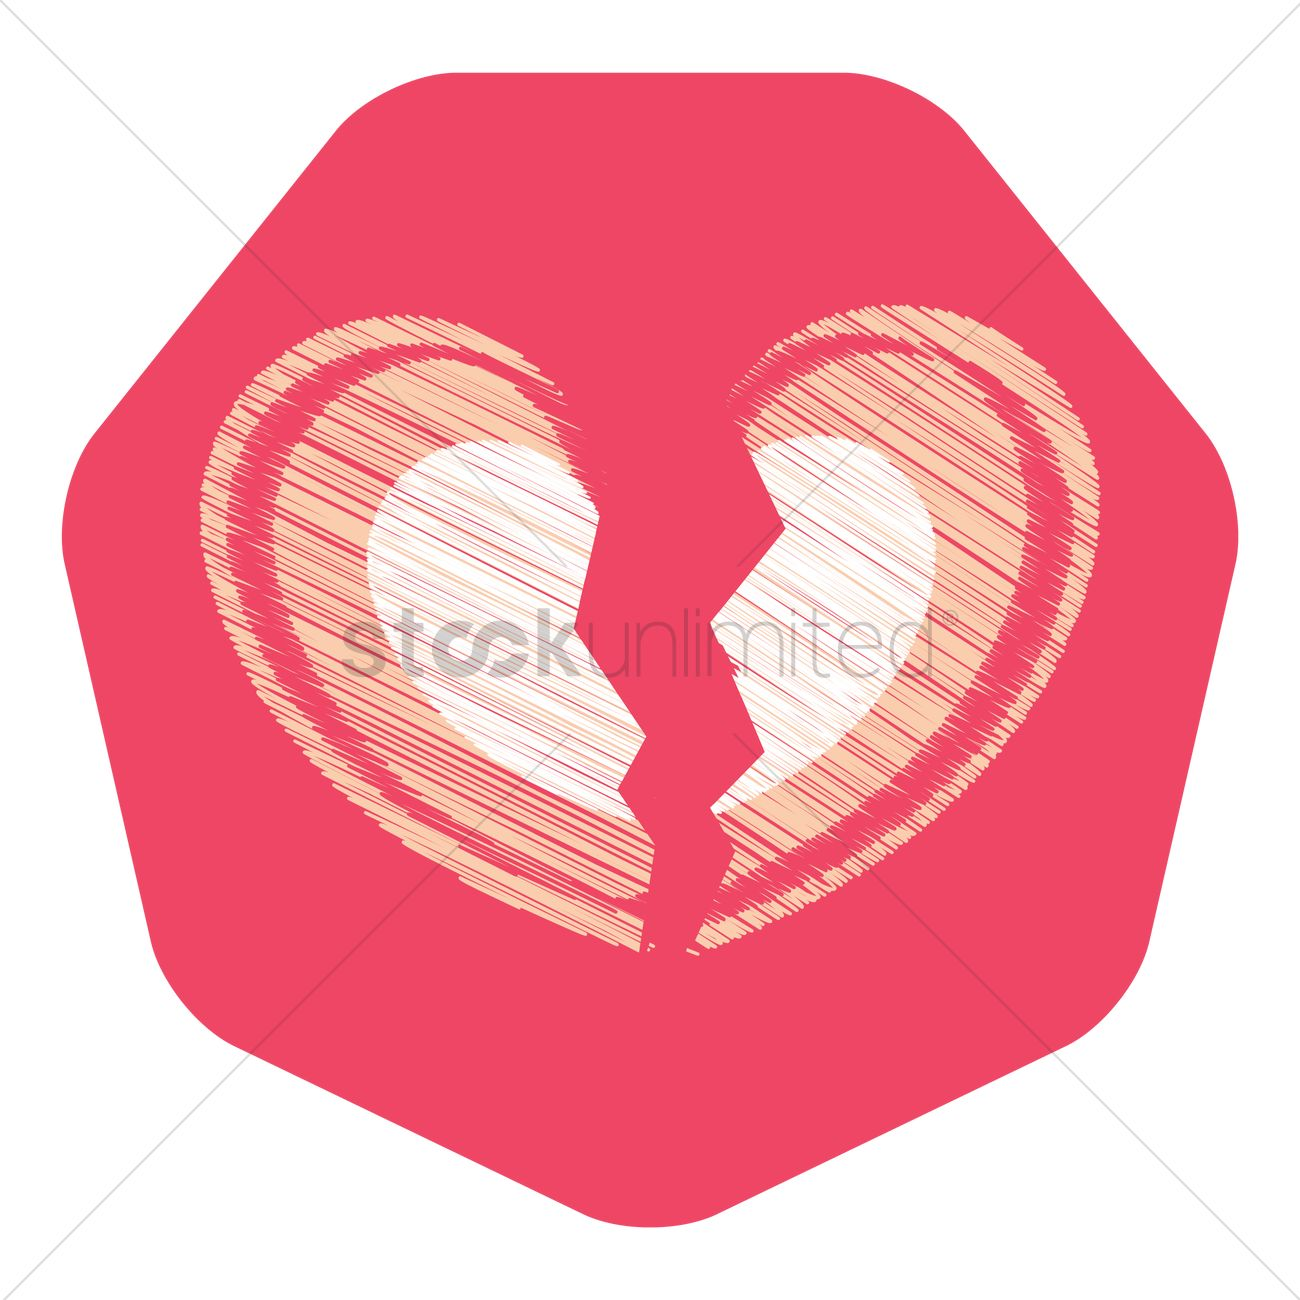 Free Heart Break Vector Image 1279040 Stockunlimited